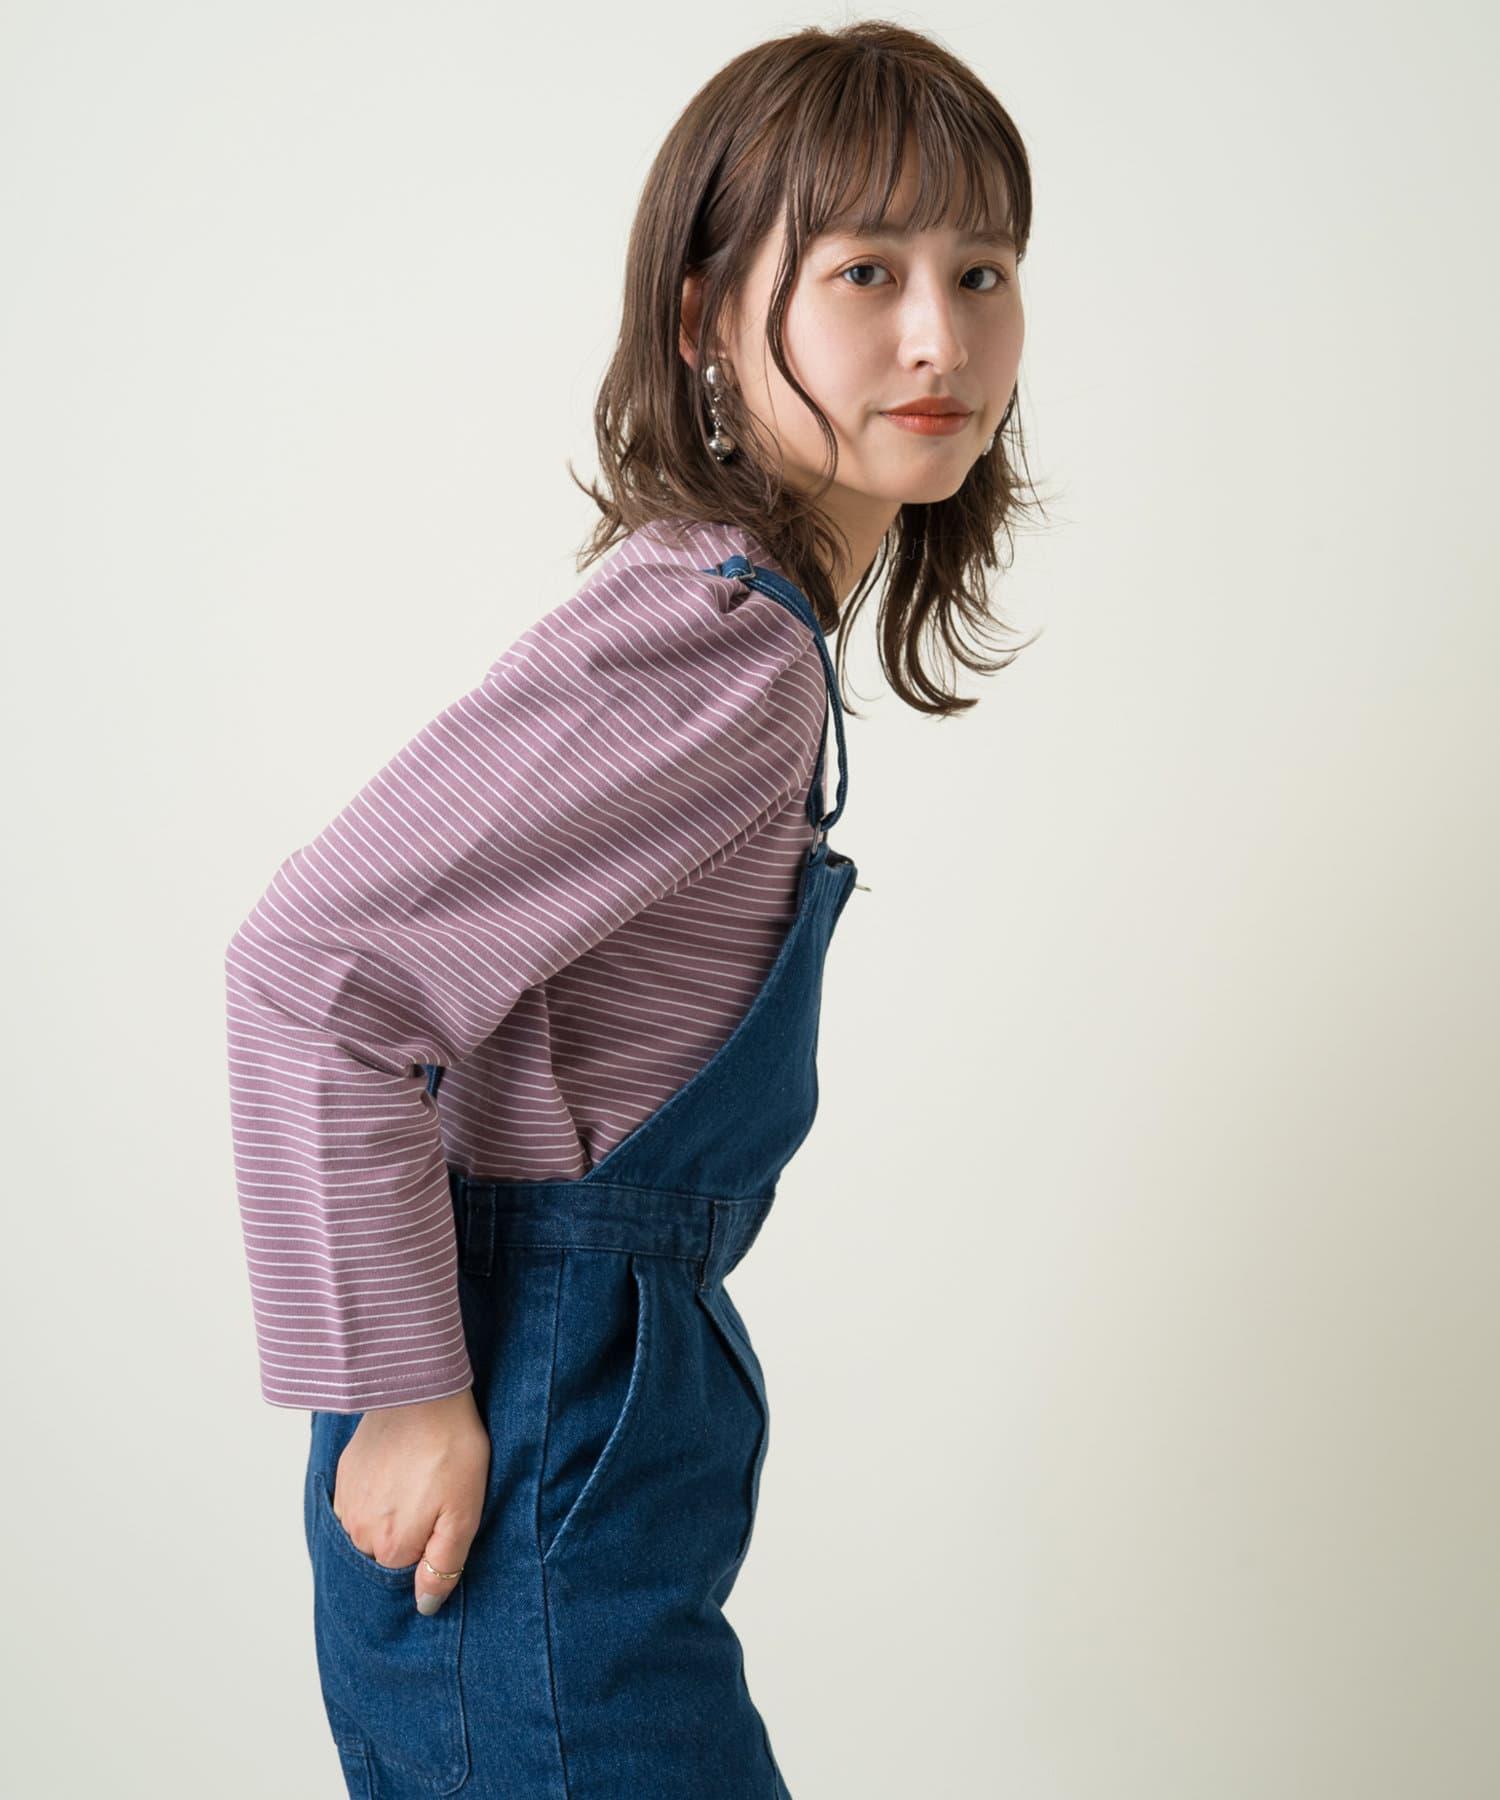 Kastane(カスタネ) パフボーダー7分袖Tee